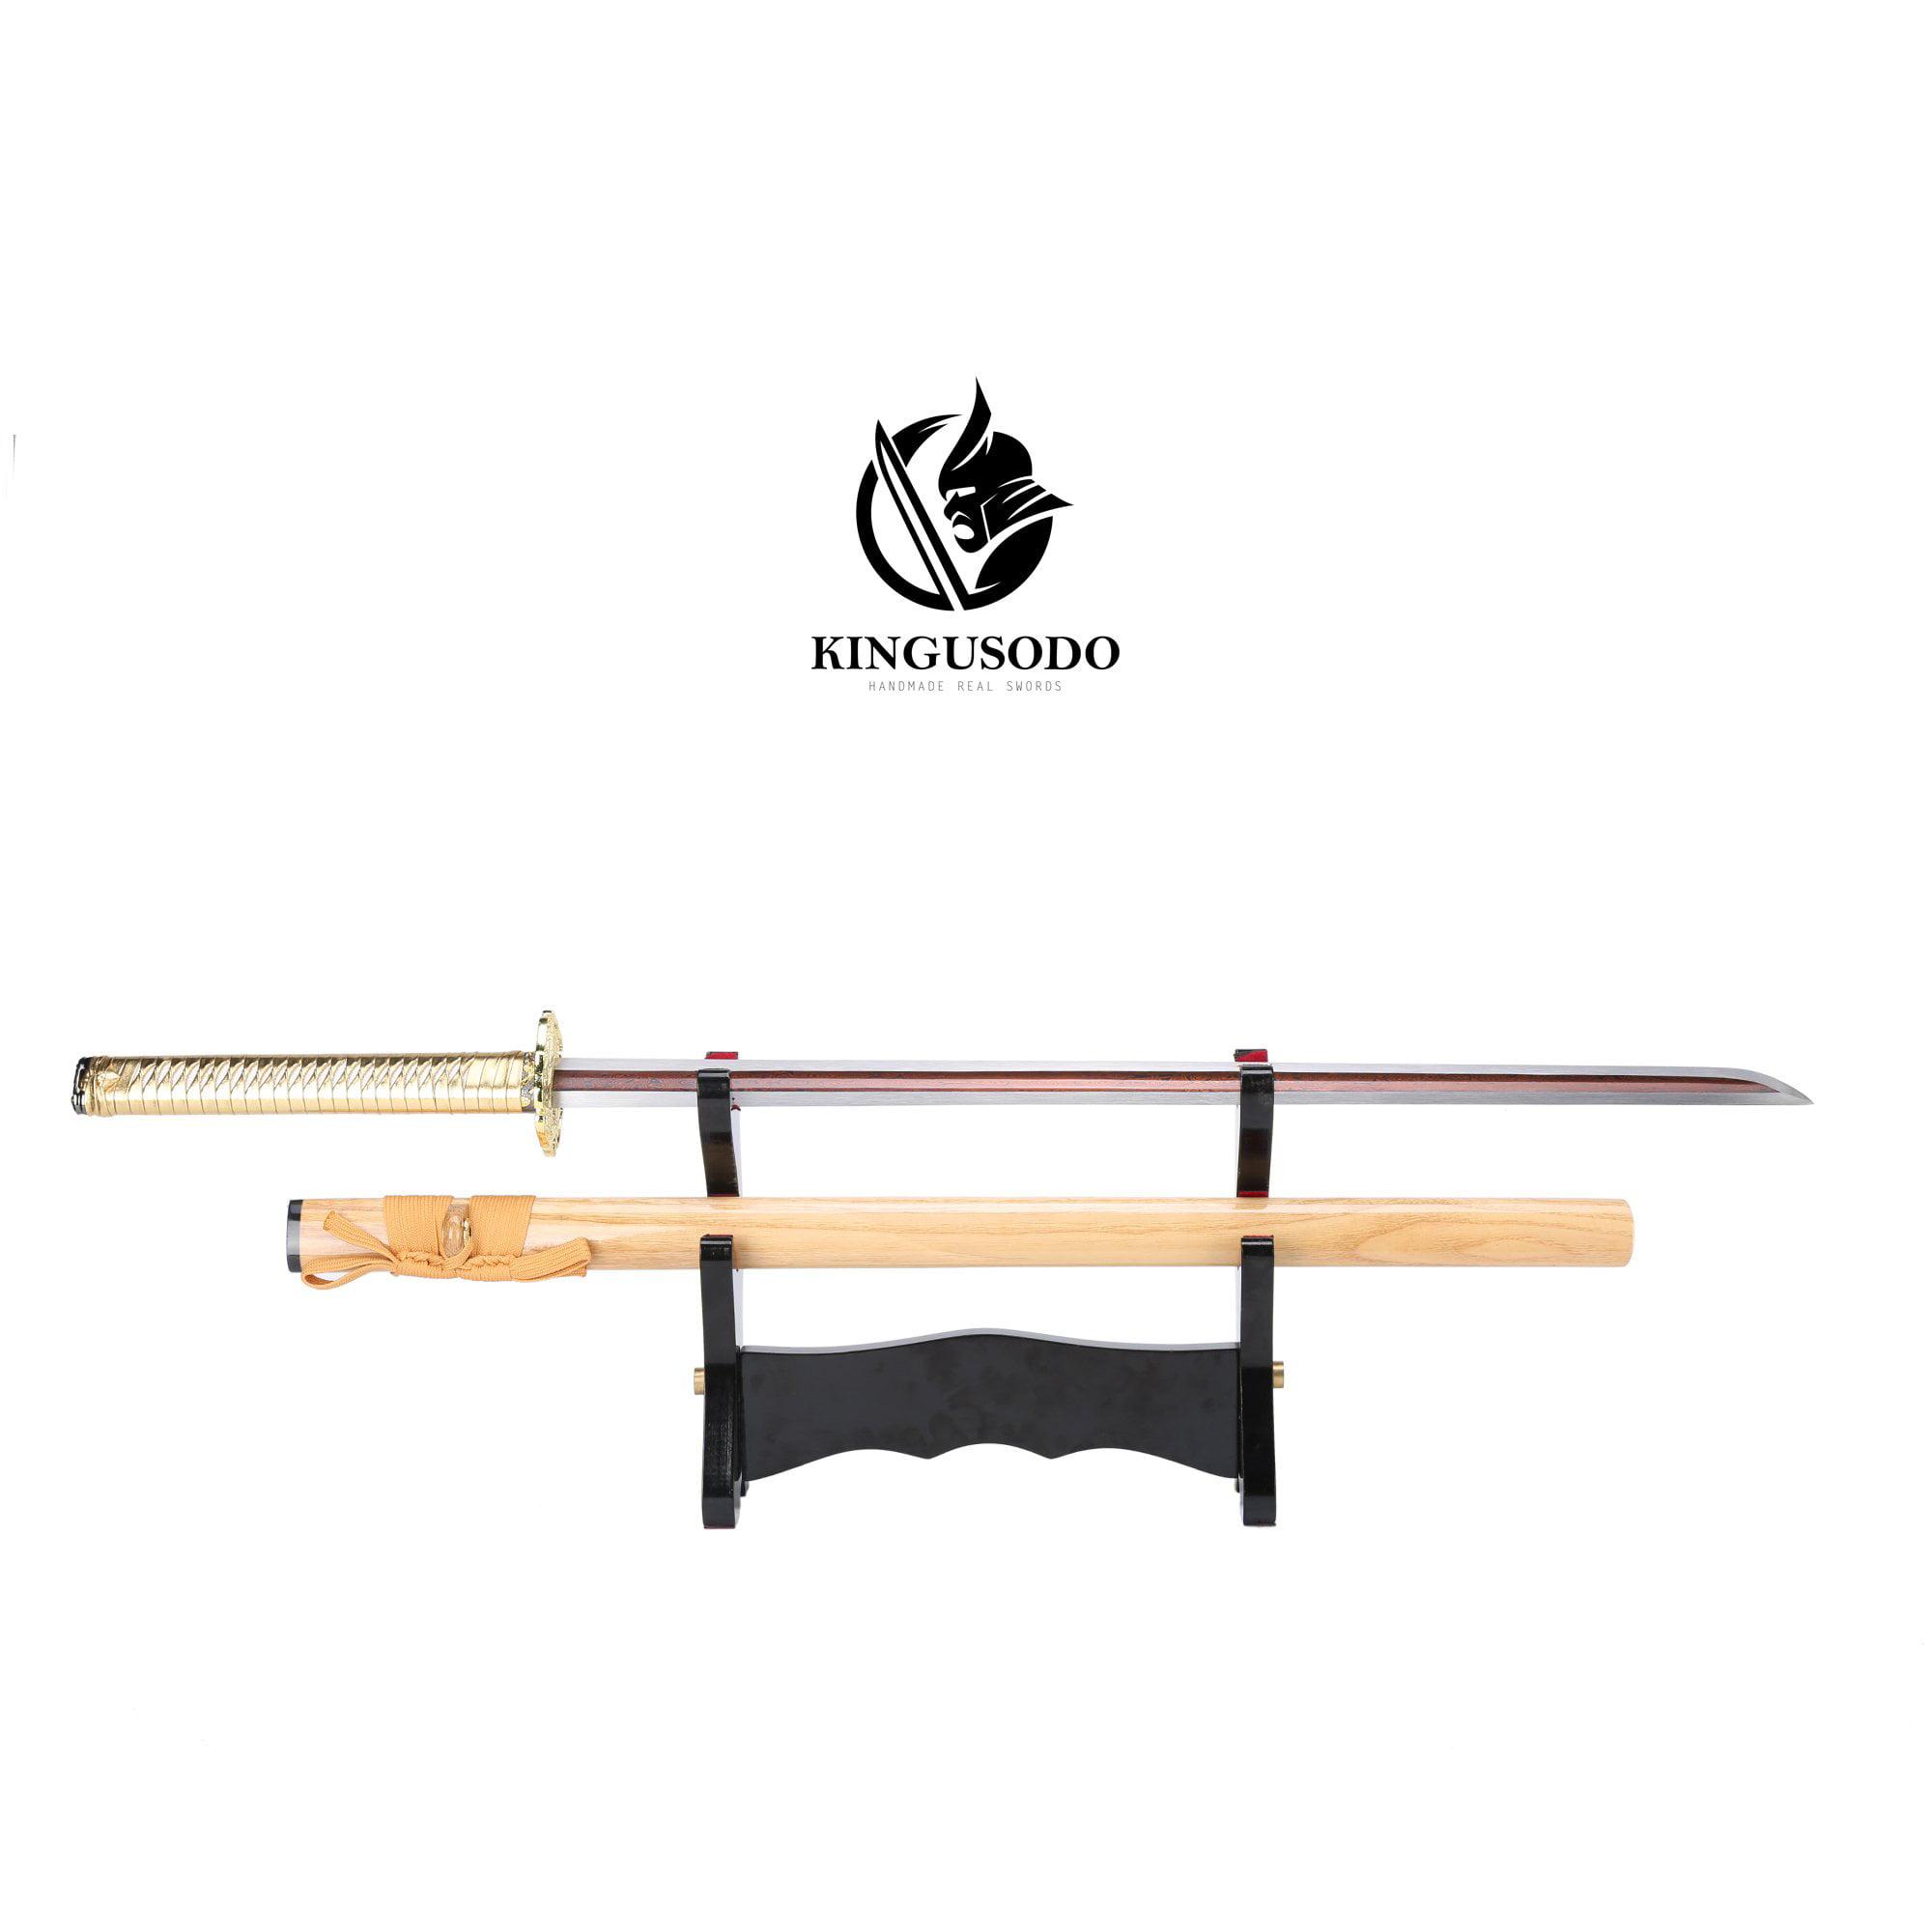 Ninja Katana Sword, 1060 Carbon Steel Handmade Japanese Sword Katana